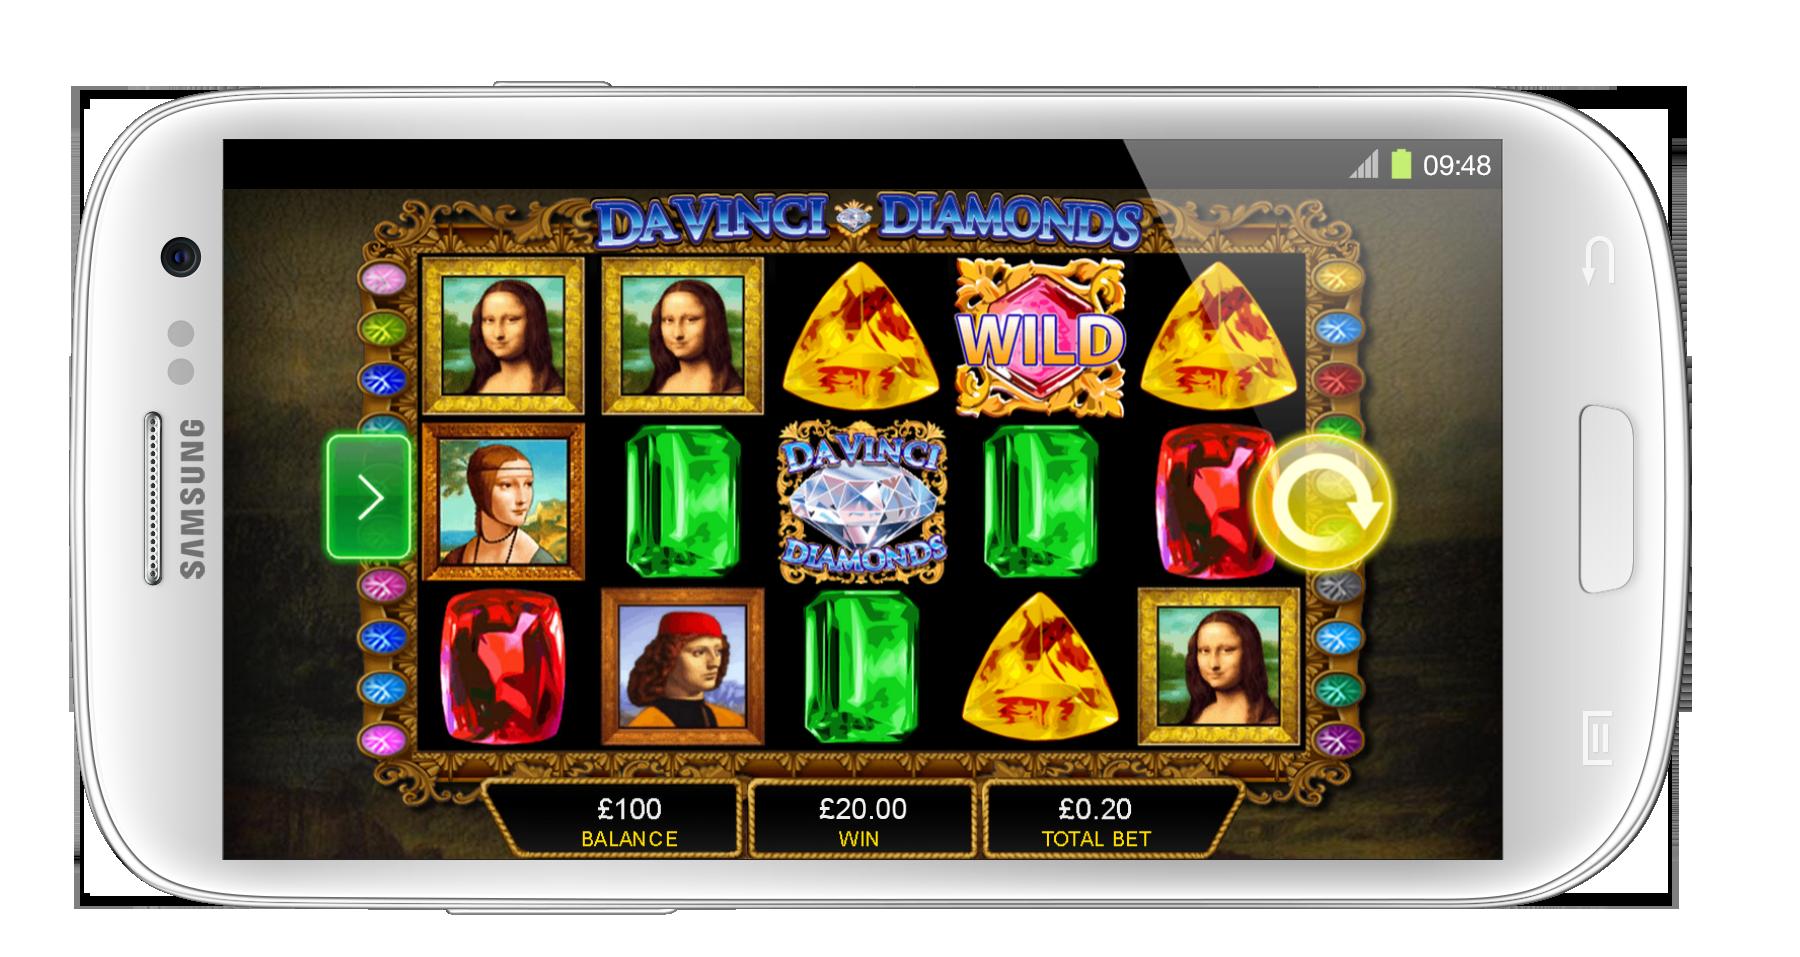 Mobile Casino And Mobile Bingo Games What S More Mobile Casino Mobile Bingo Casino